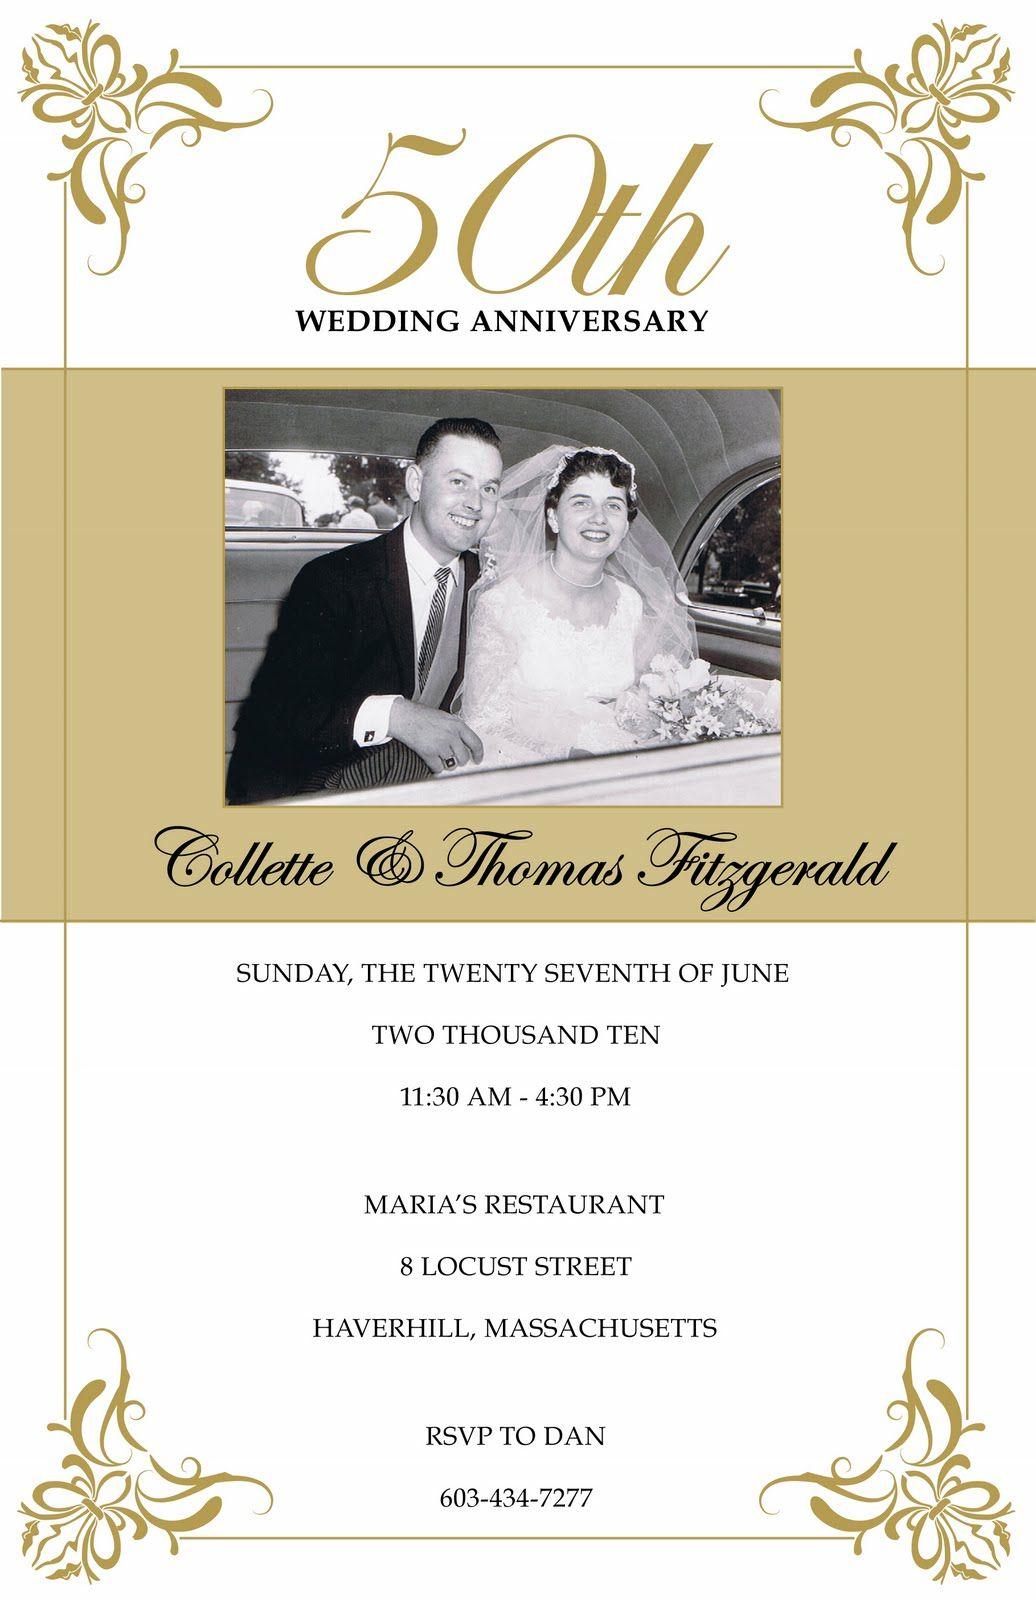 Photo Gallery Of The 50Th Wedding Anniversary Party Ideas To - Free Printable 60Th Wedding Anniversary Invitations